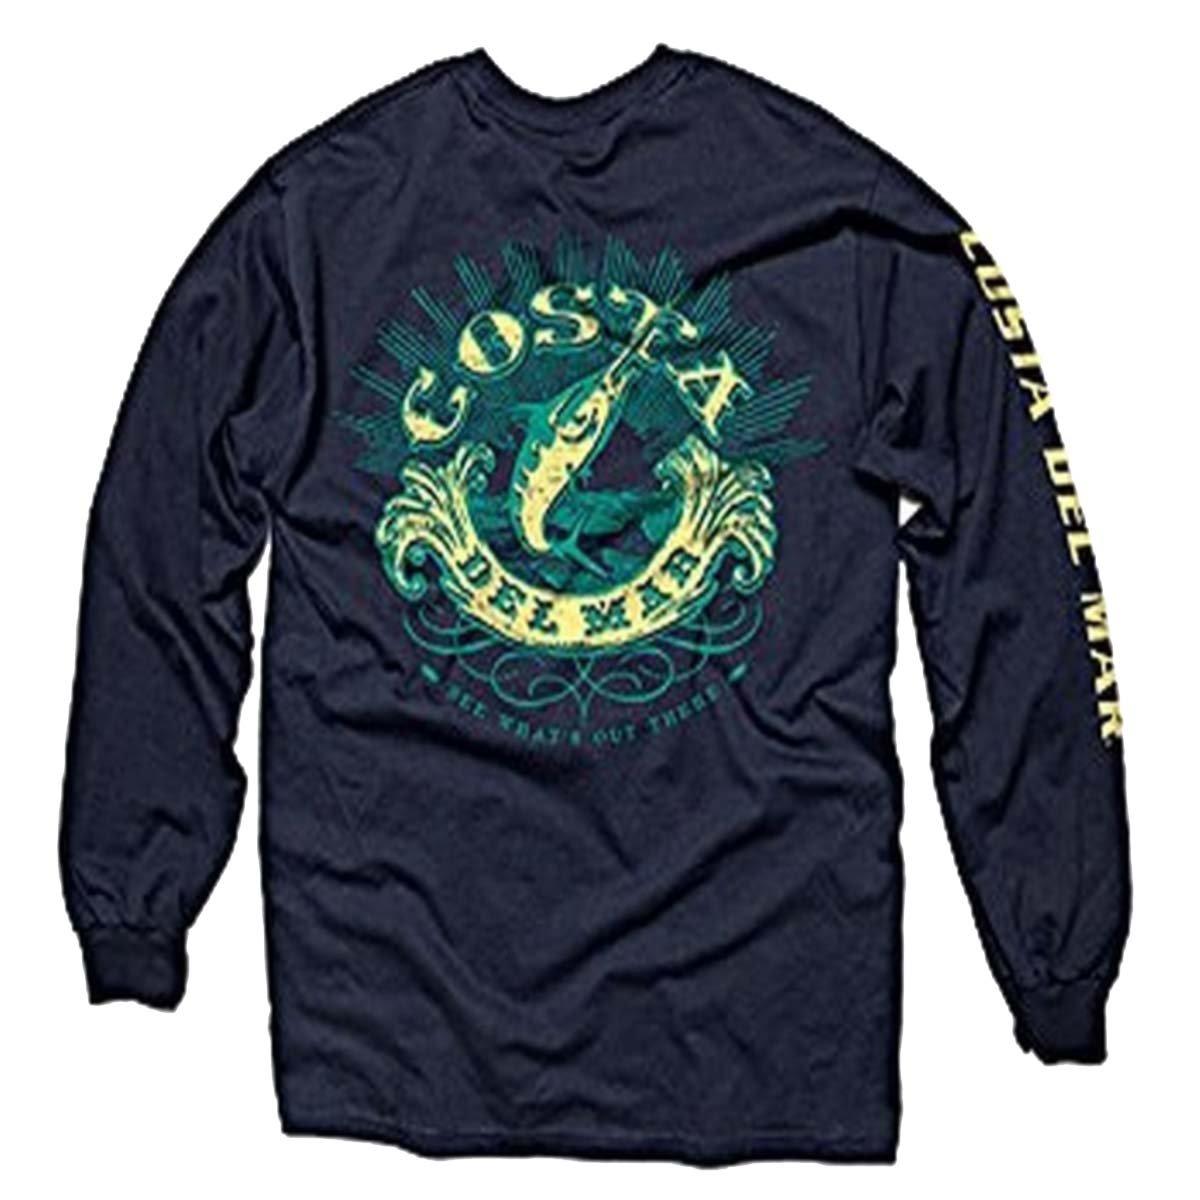 cf6e31c0 Costa Del Mar Realtree Max 4 Camo T Shirt – EDGE Engineering and ...